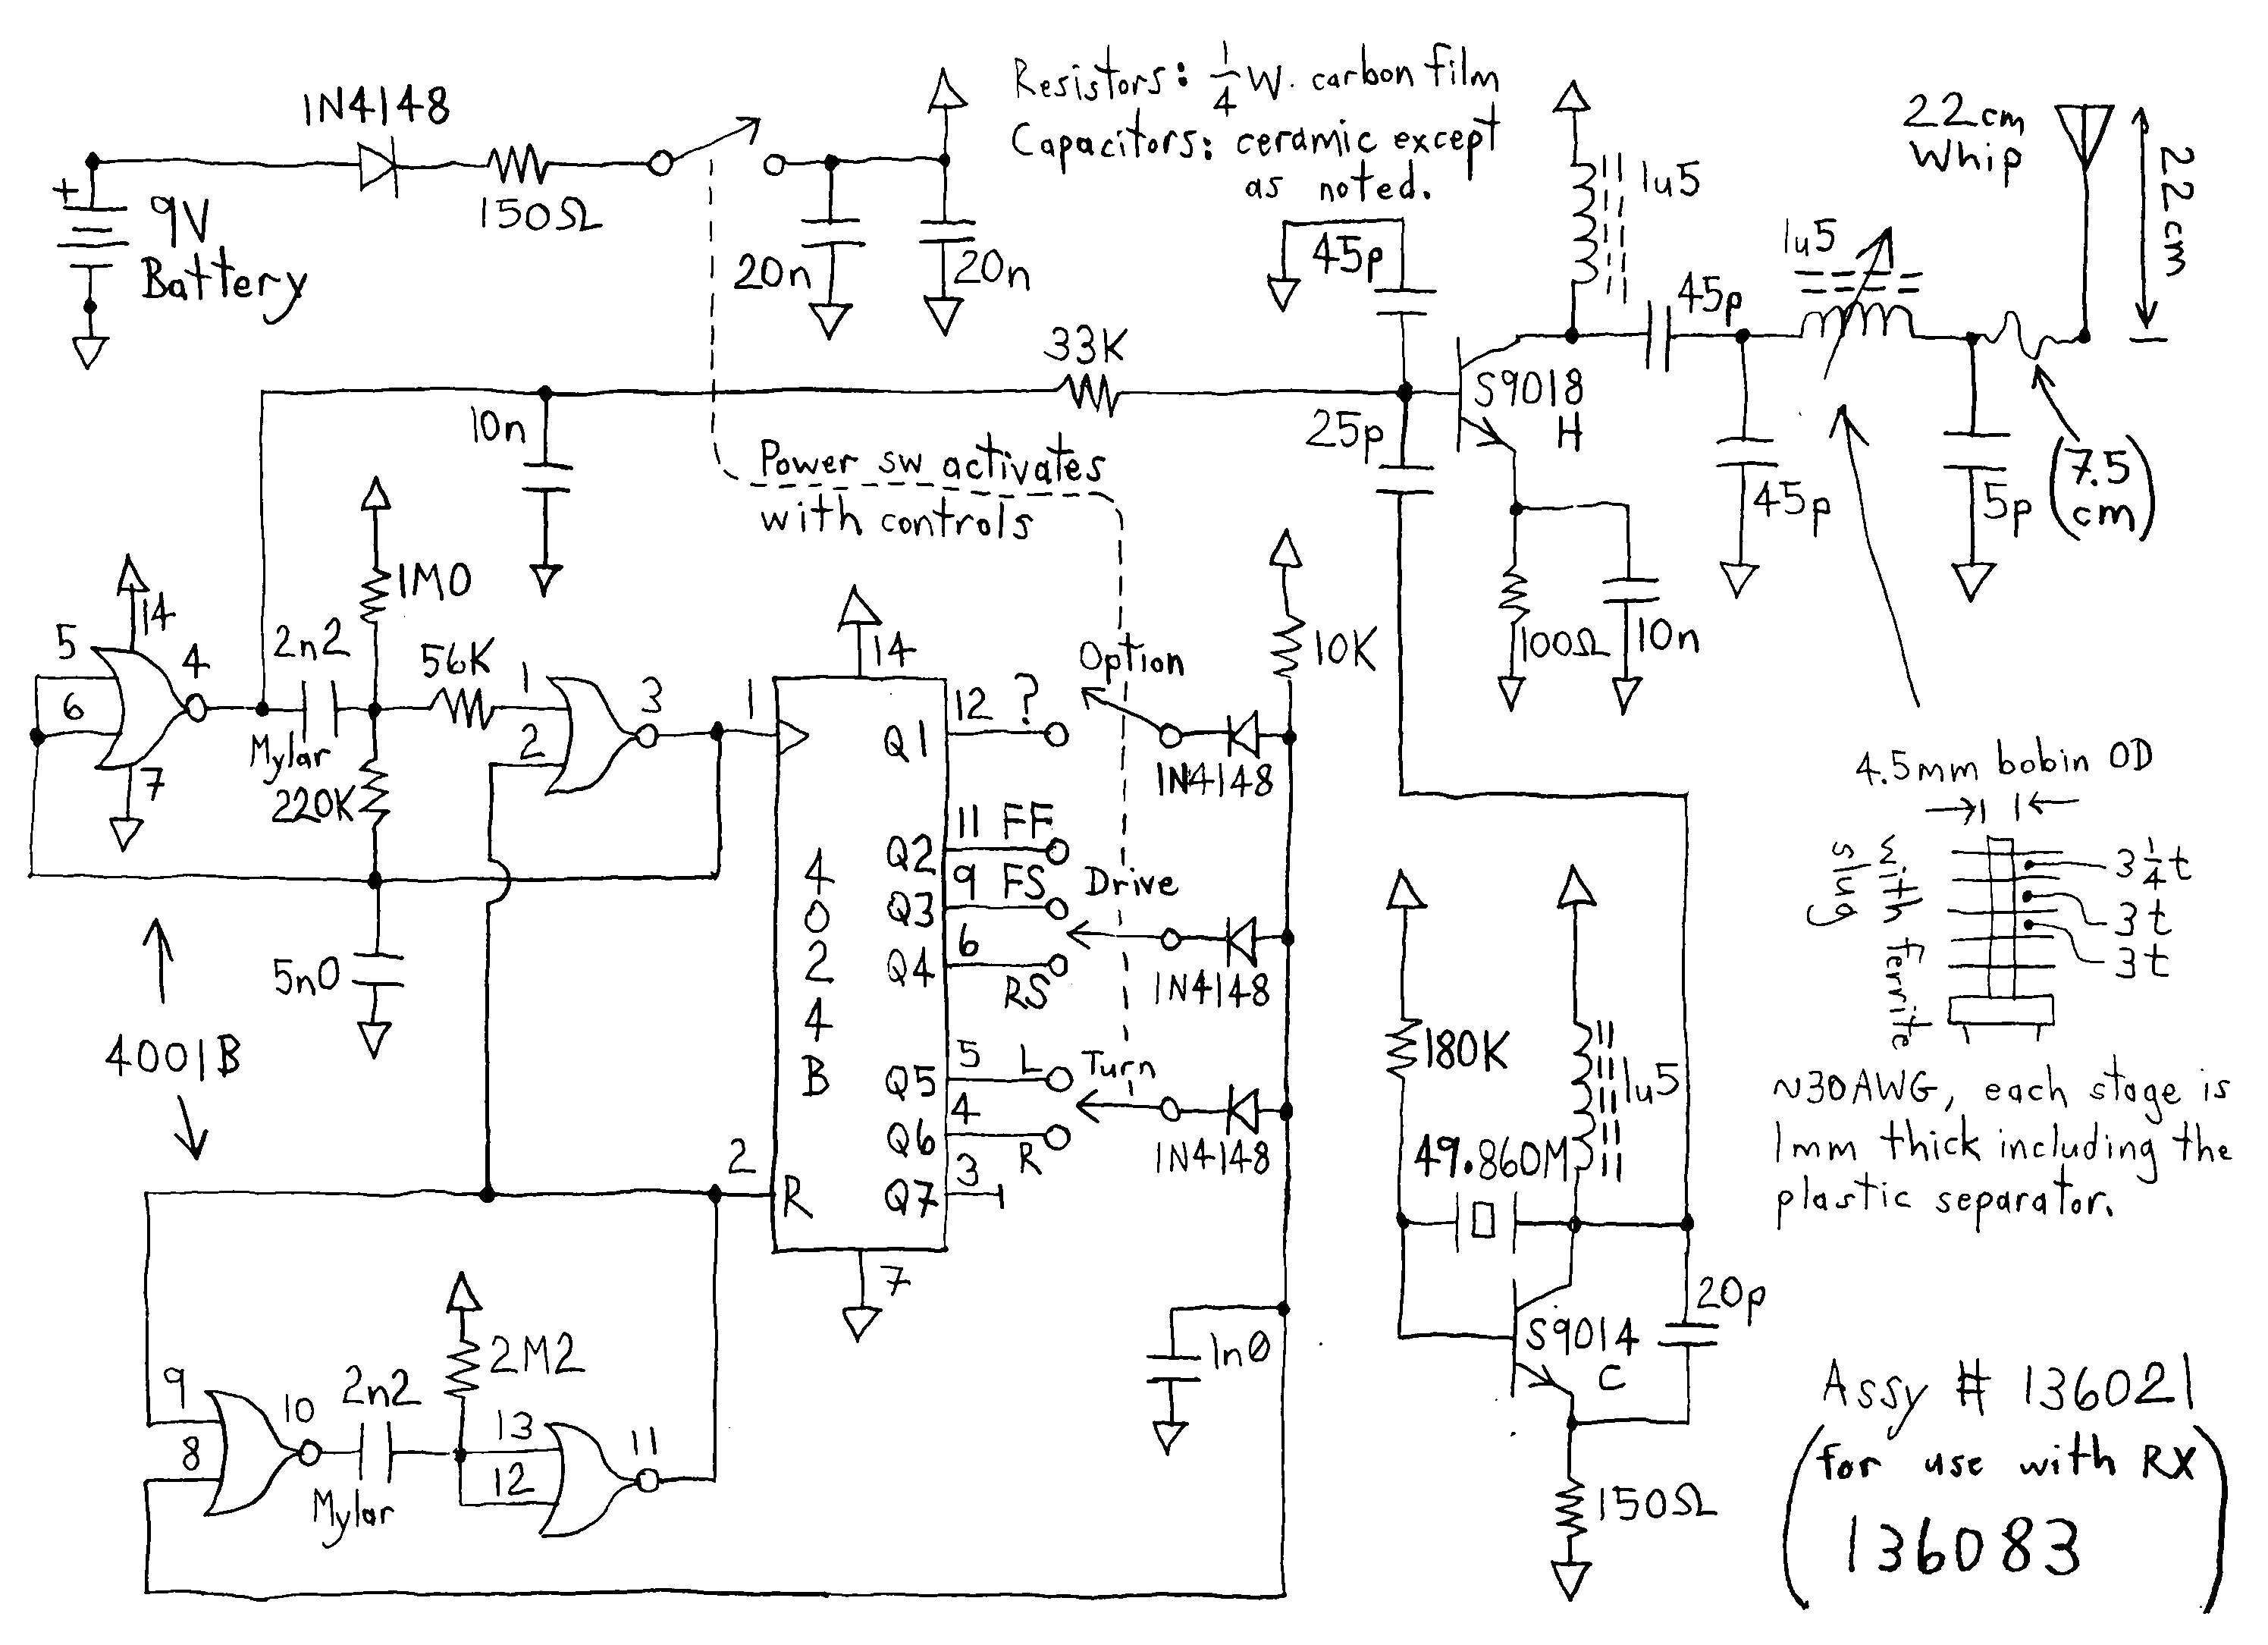 cadillac srx wiring use wiring diagramcadillac srx wiring diagram wiring diagram name 2004 cadillac srx wiring